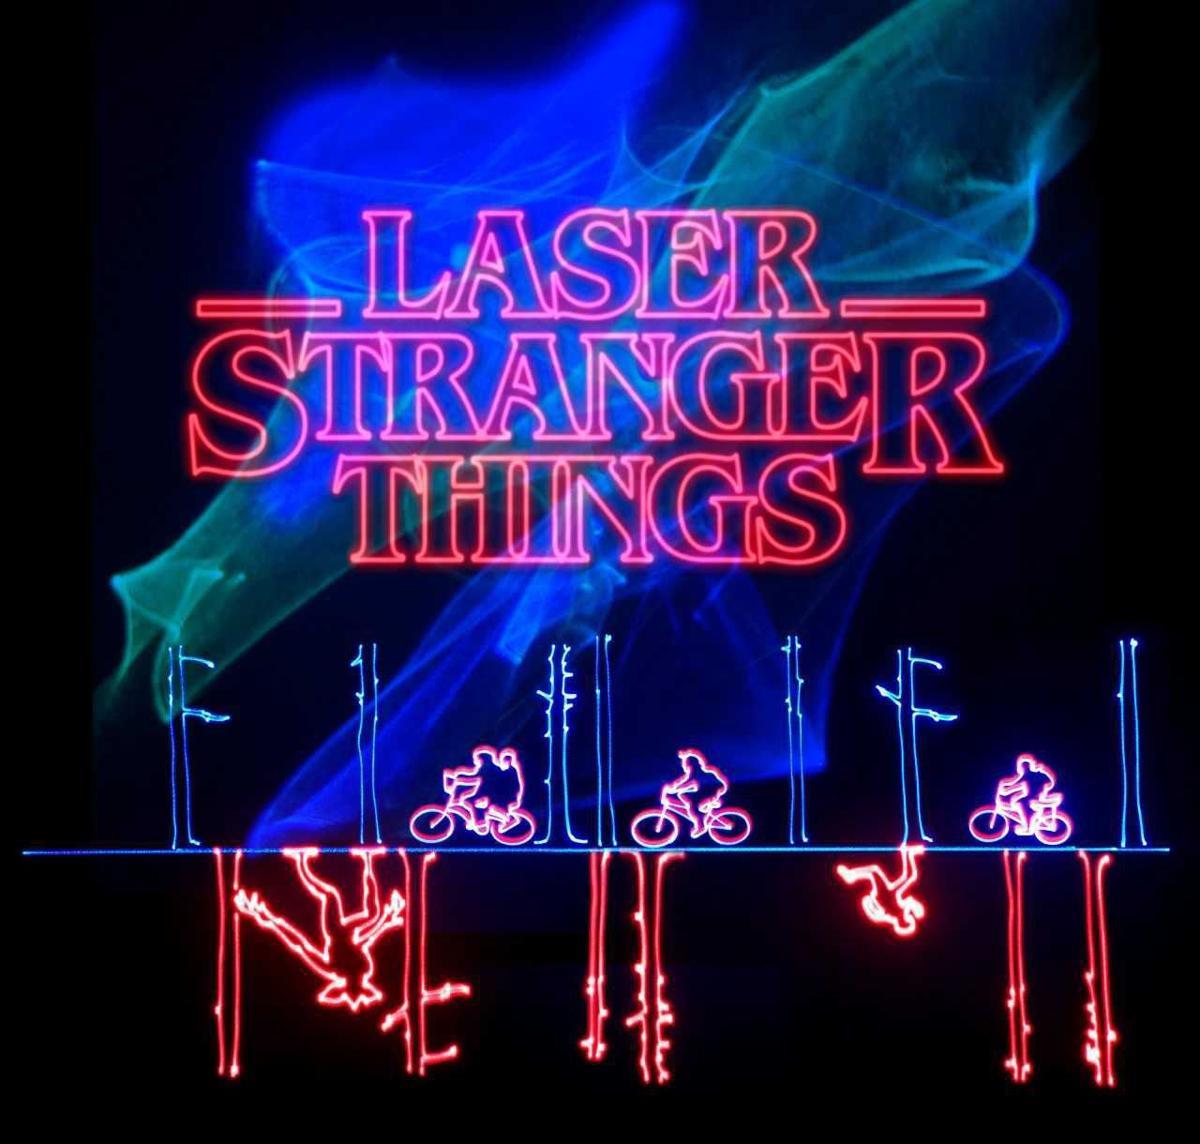 Stranger Things' laser music show at Tucson's Flandrau